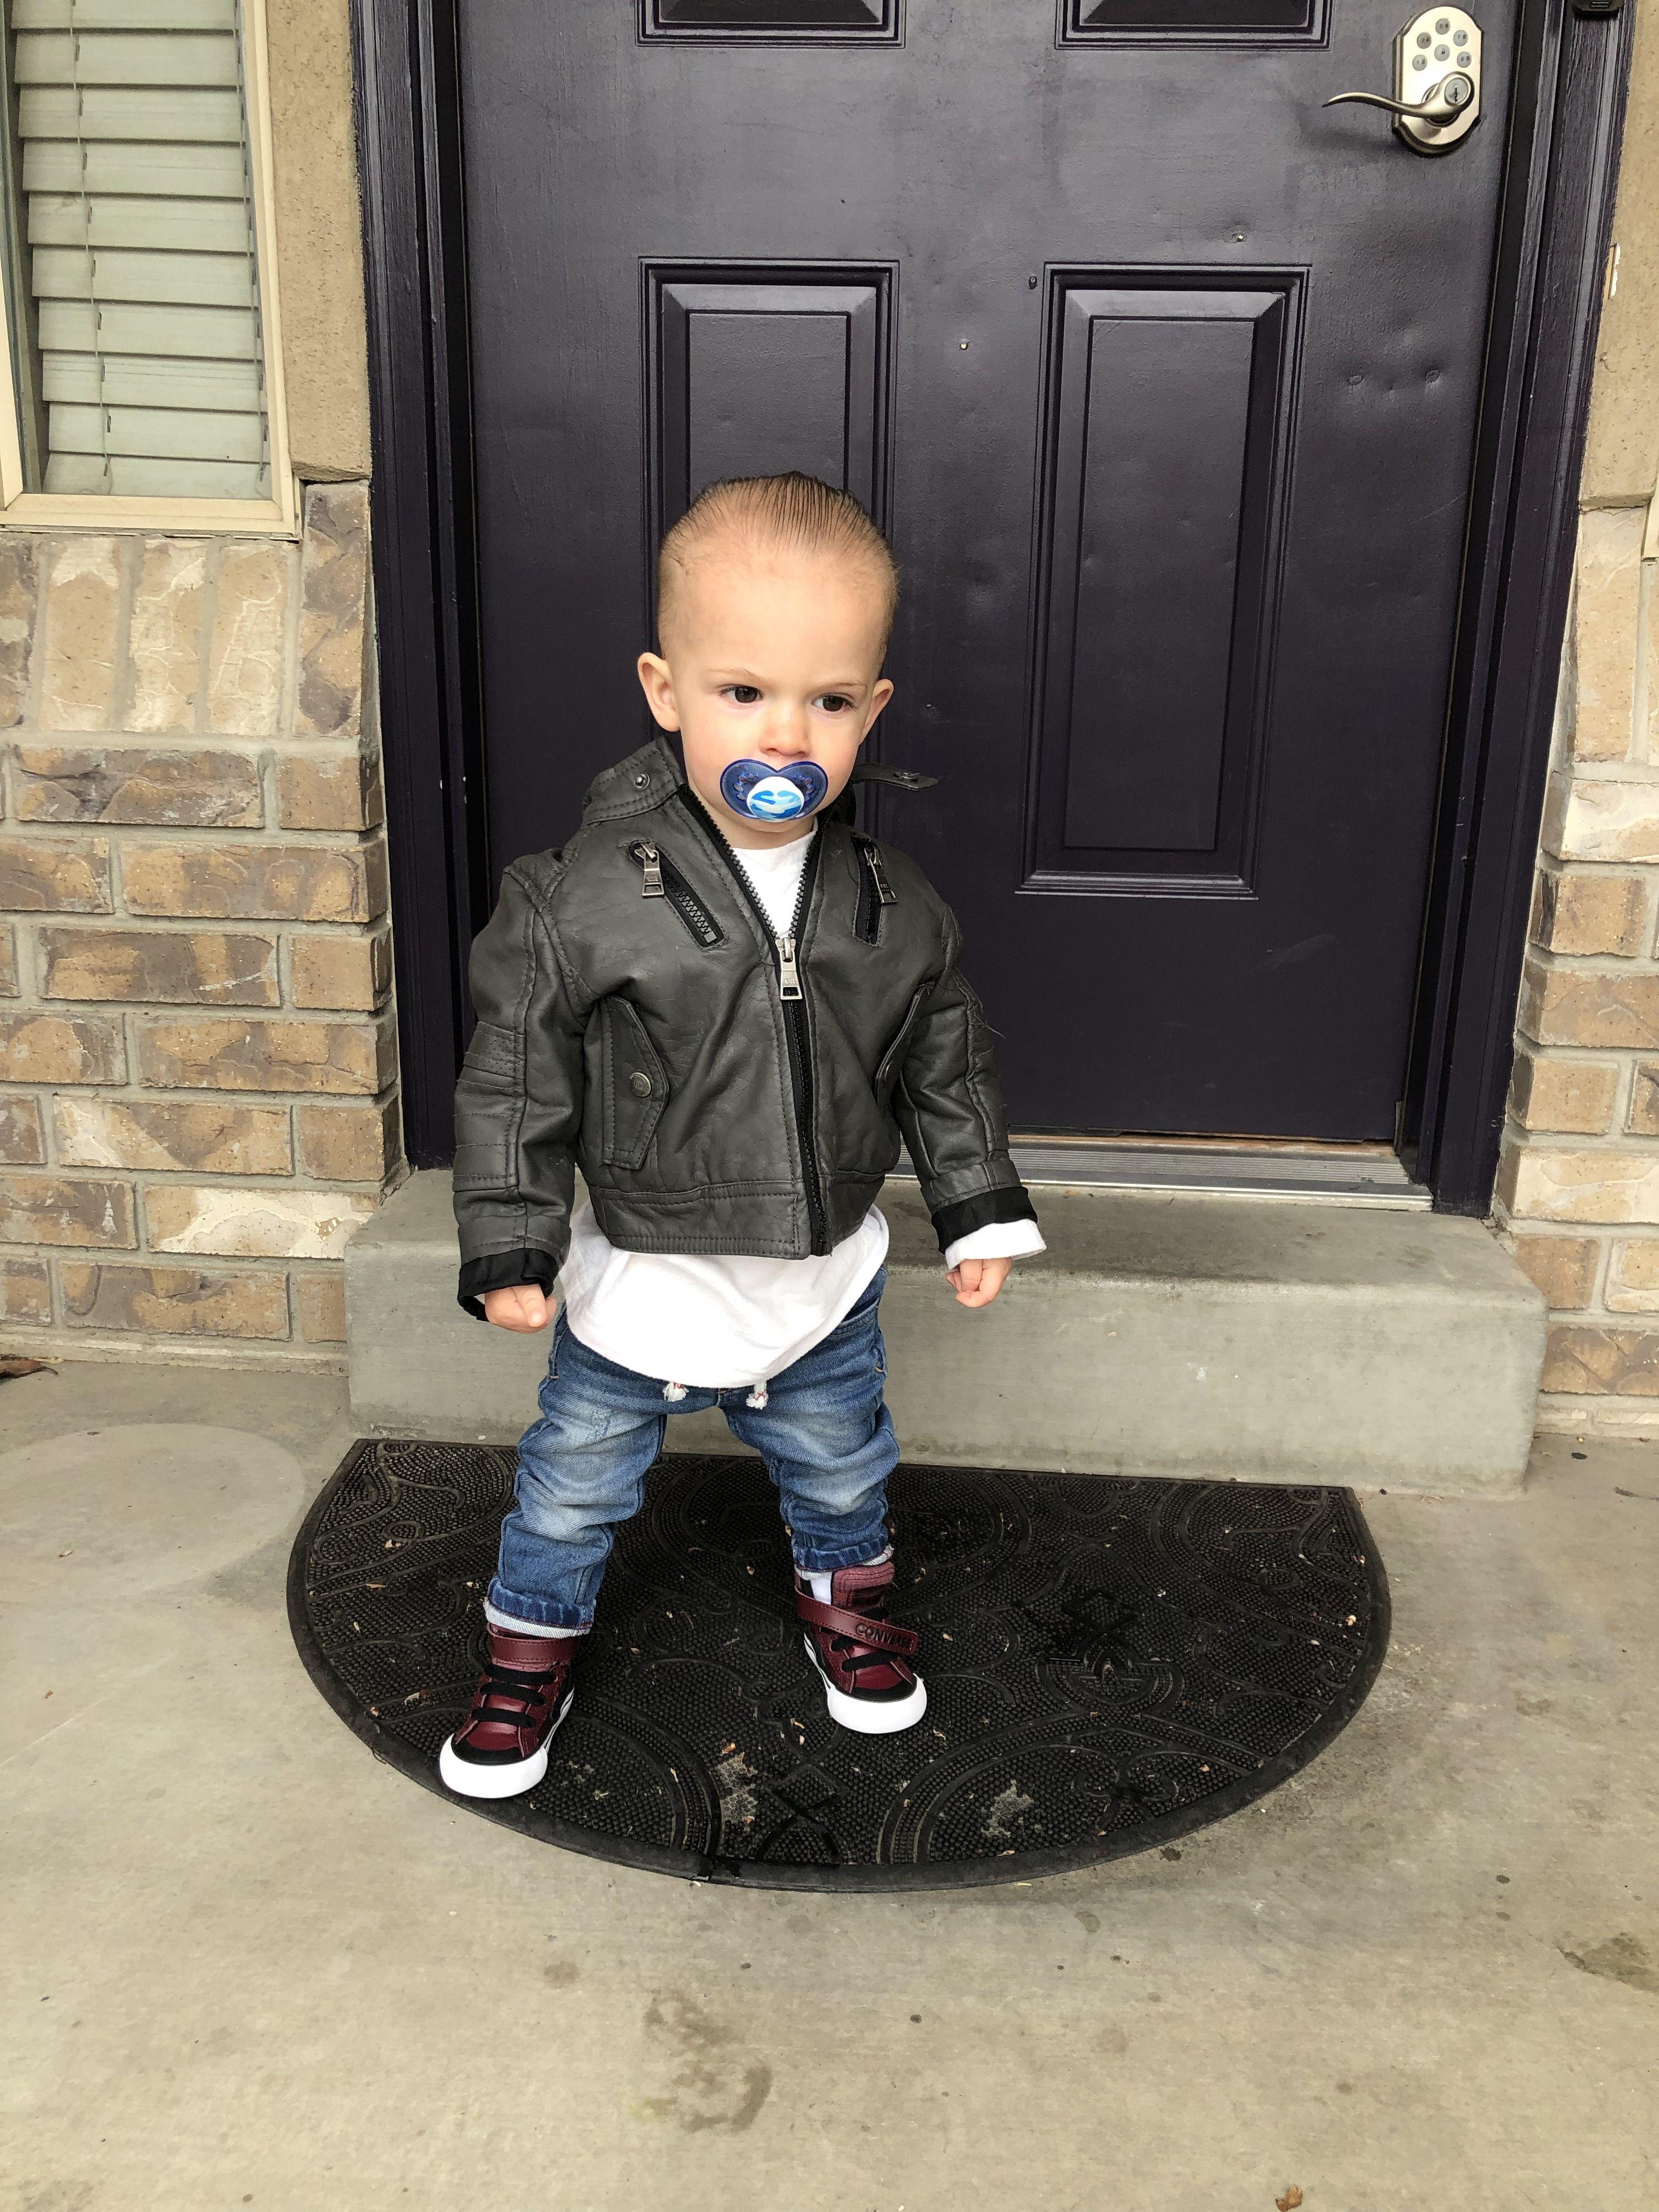 Toddler Fashion Skinny Jeans Slick Back Hair And Leather Jacket Toddler Fashion Slicked Back Hair Skinny [ 4032 x 3024 Pixel ]